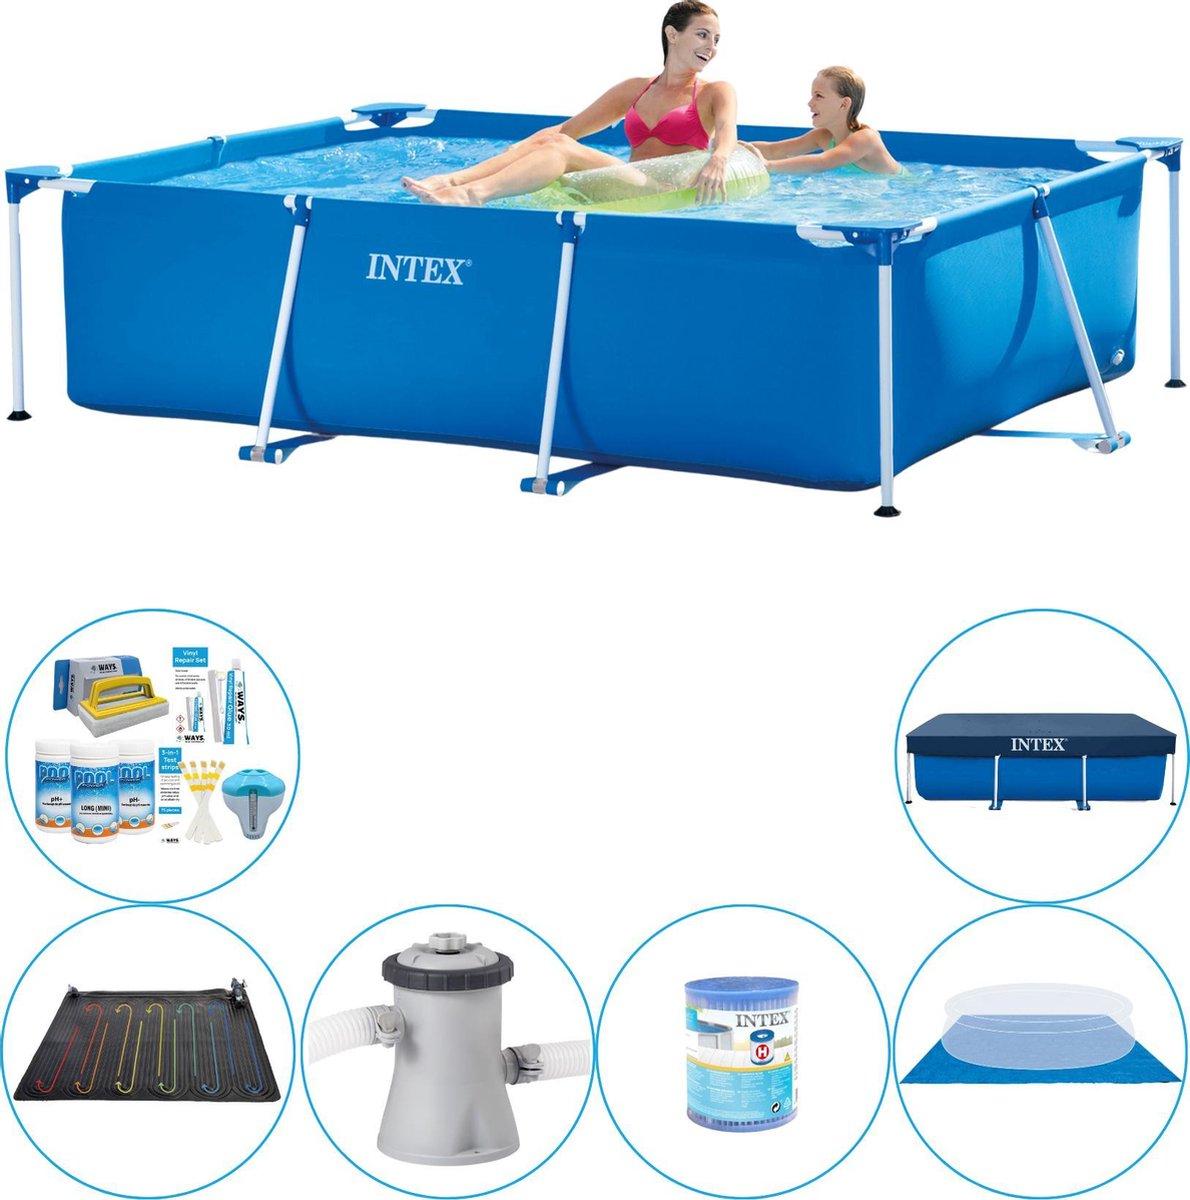 Intex Frame Pool Zwembad Deluxe Deal - 220 x 150 x 60 cm